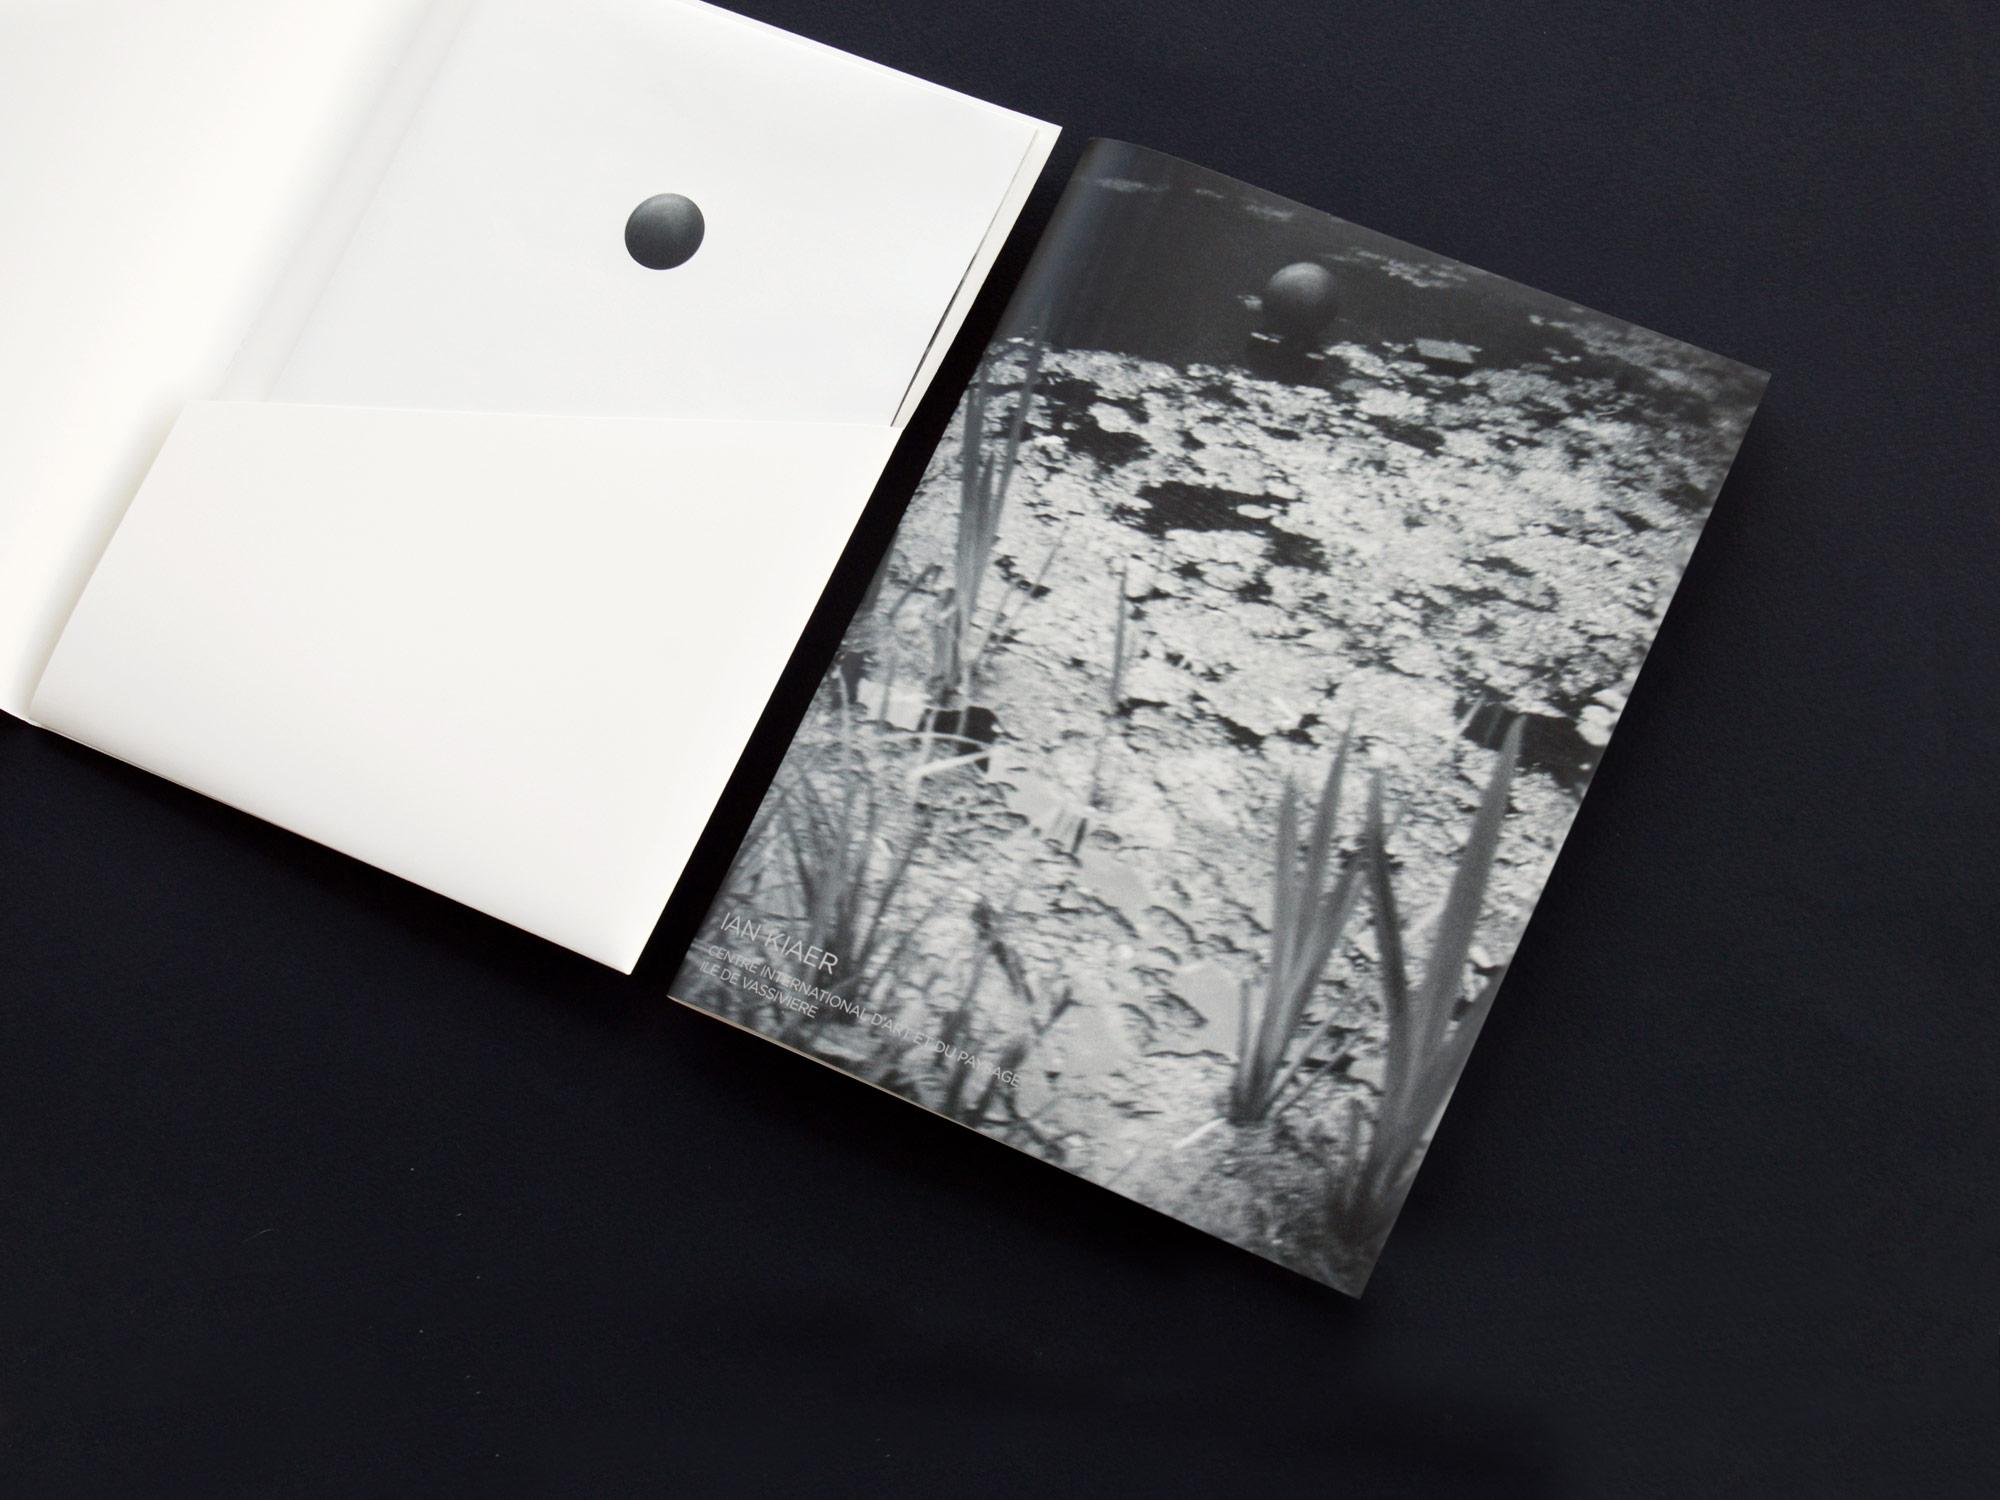 http://a-aa.fr/projet/catalogue-ian-kiaer/